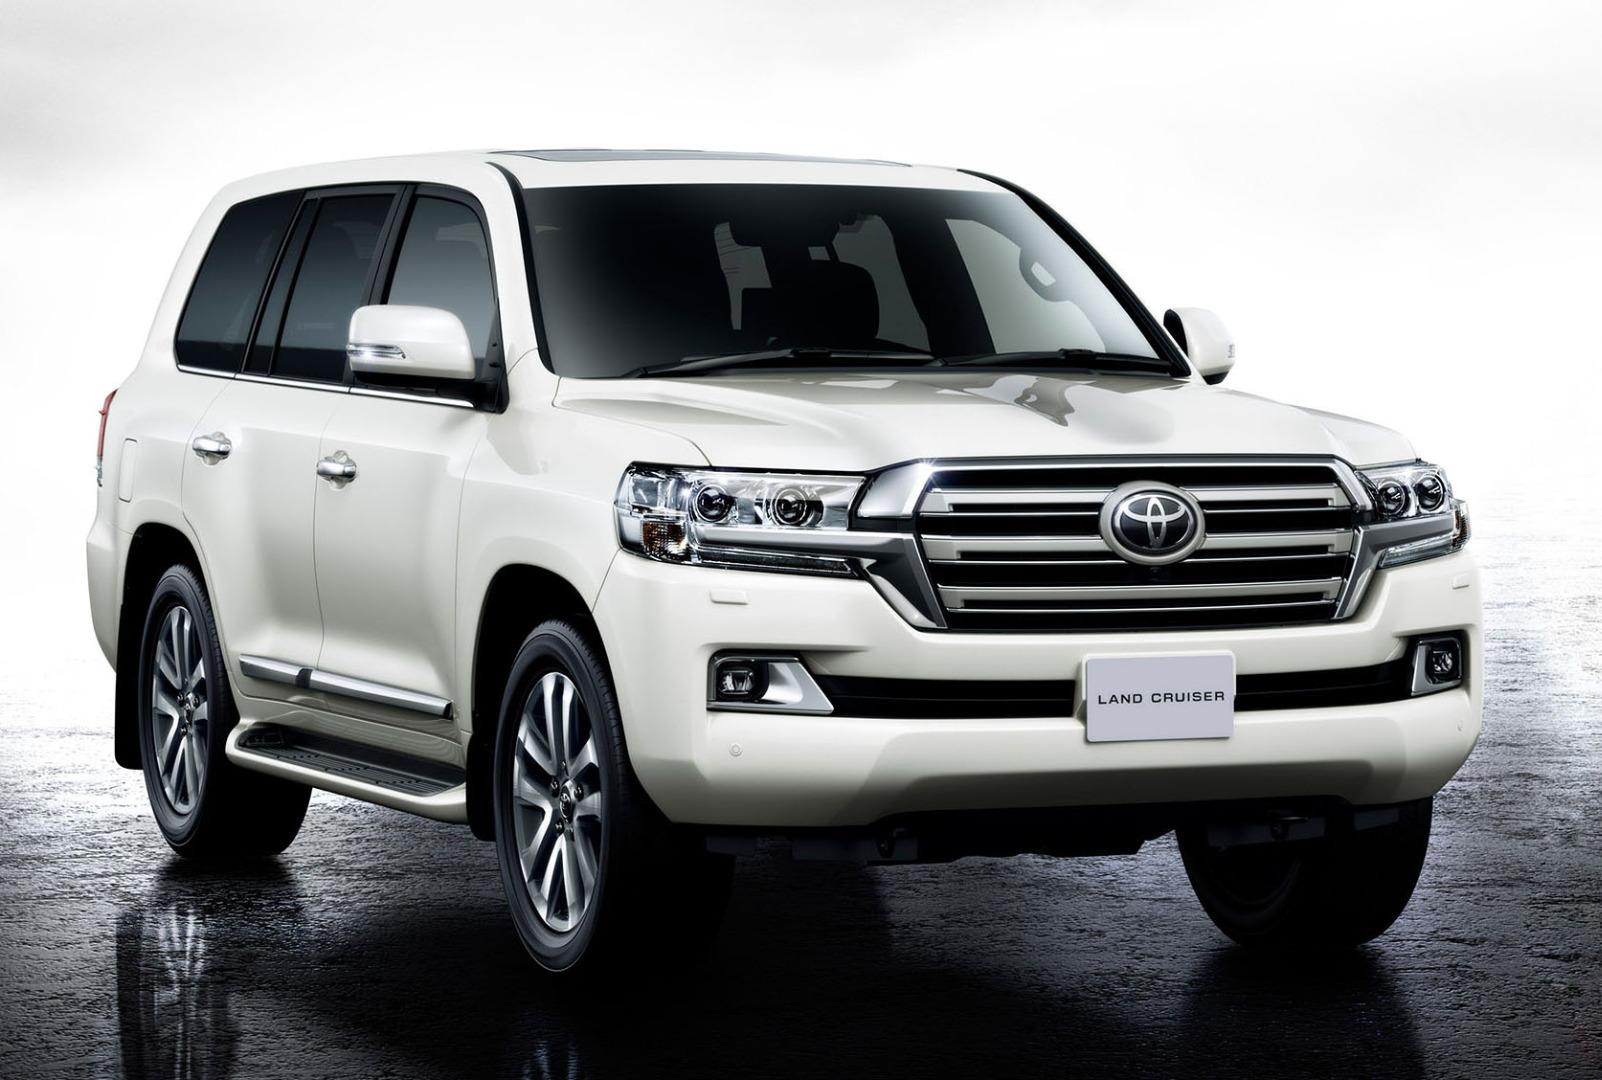 Toyota Landcruiser 300 >> Toyota Malawi | Land Cruiser 200 V8